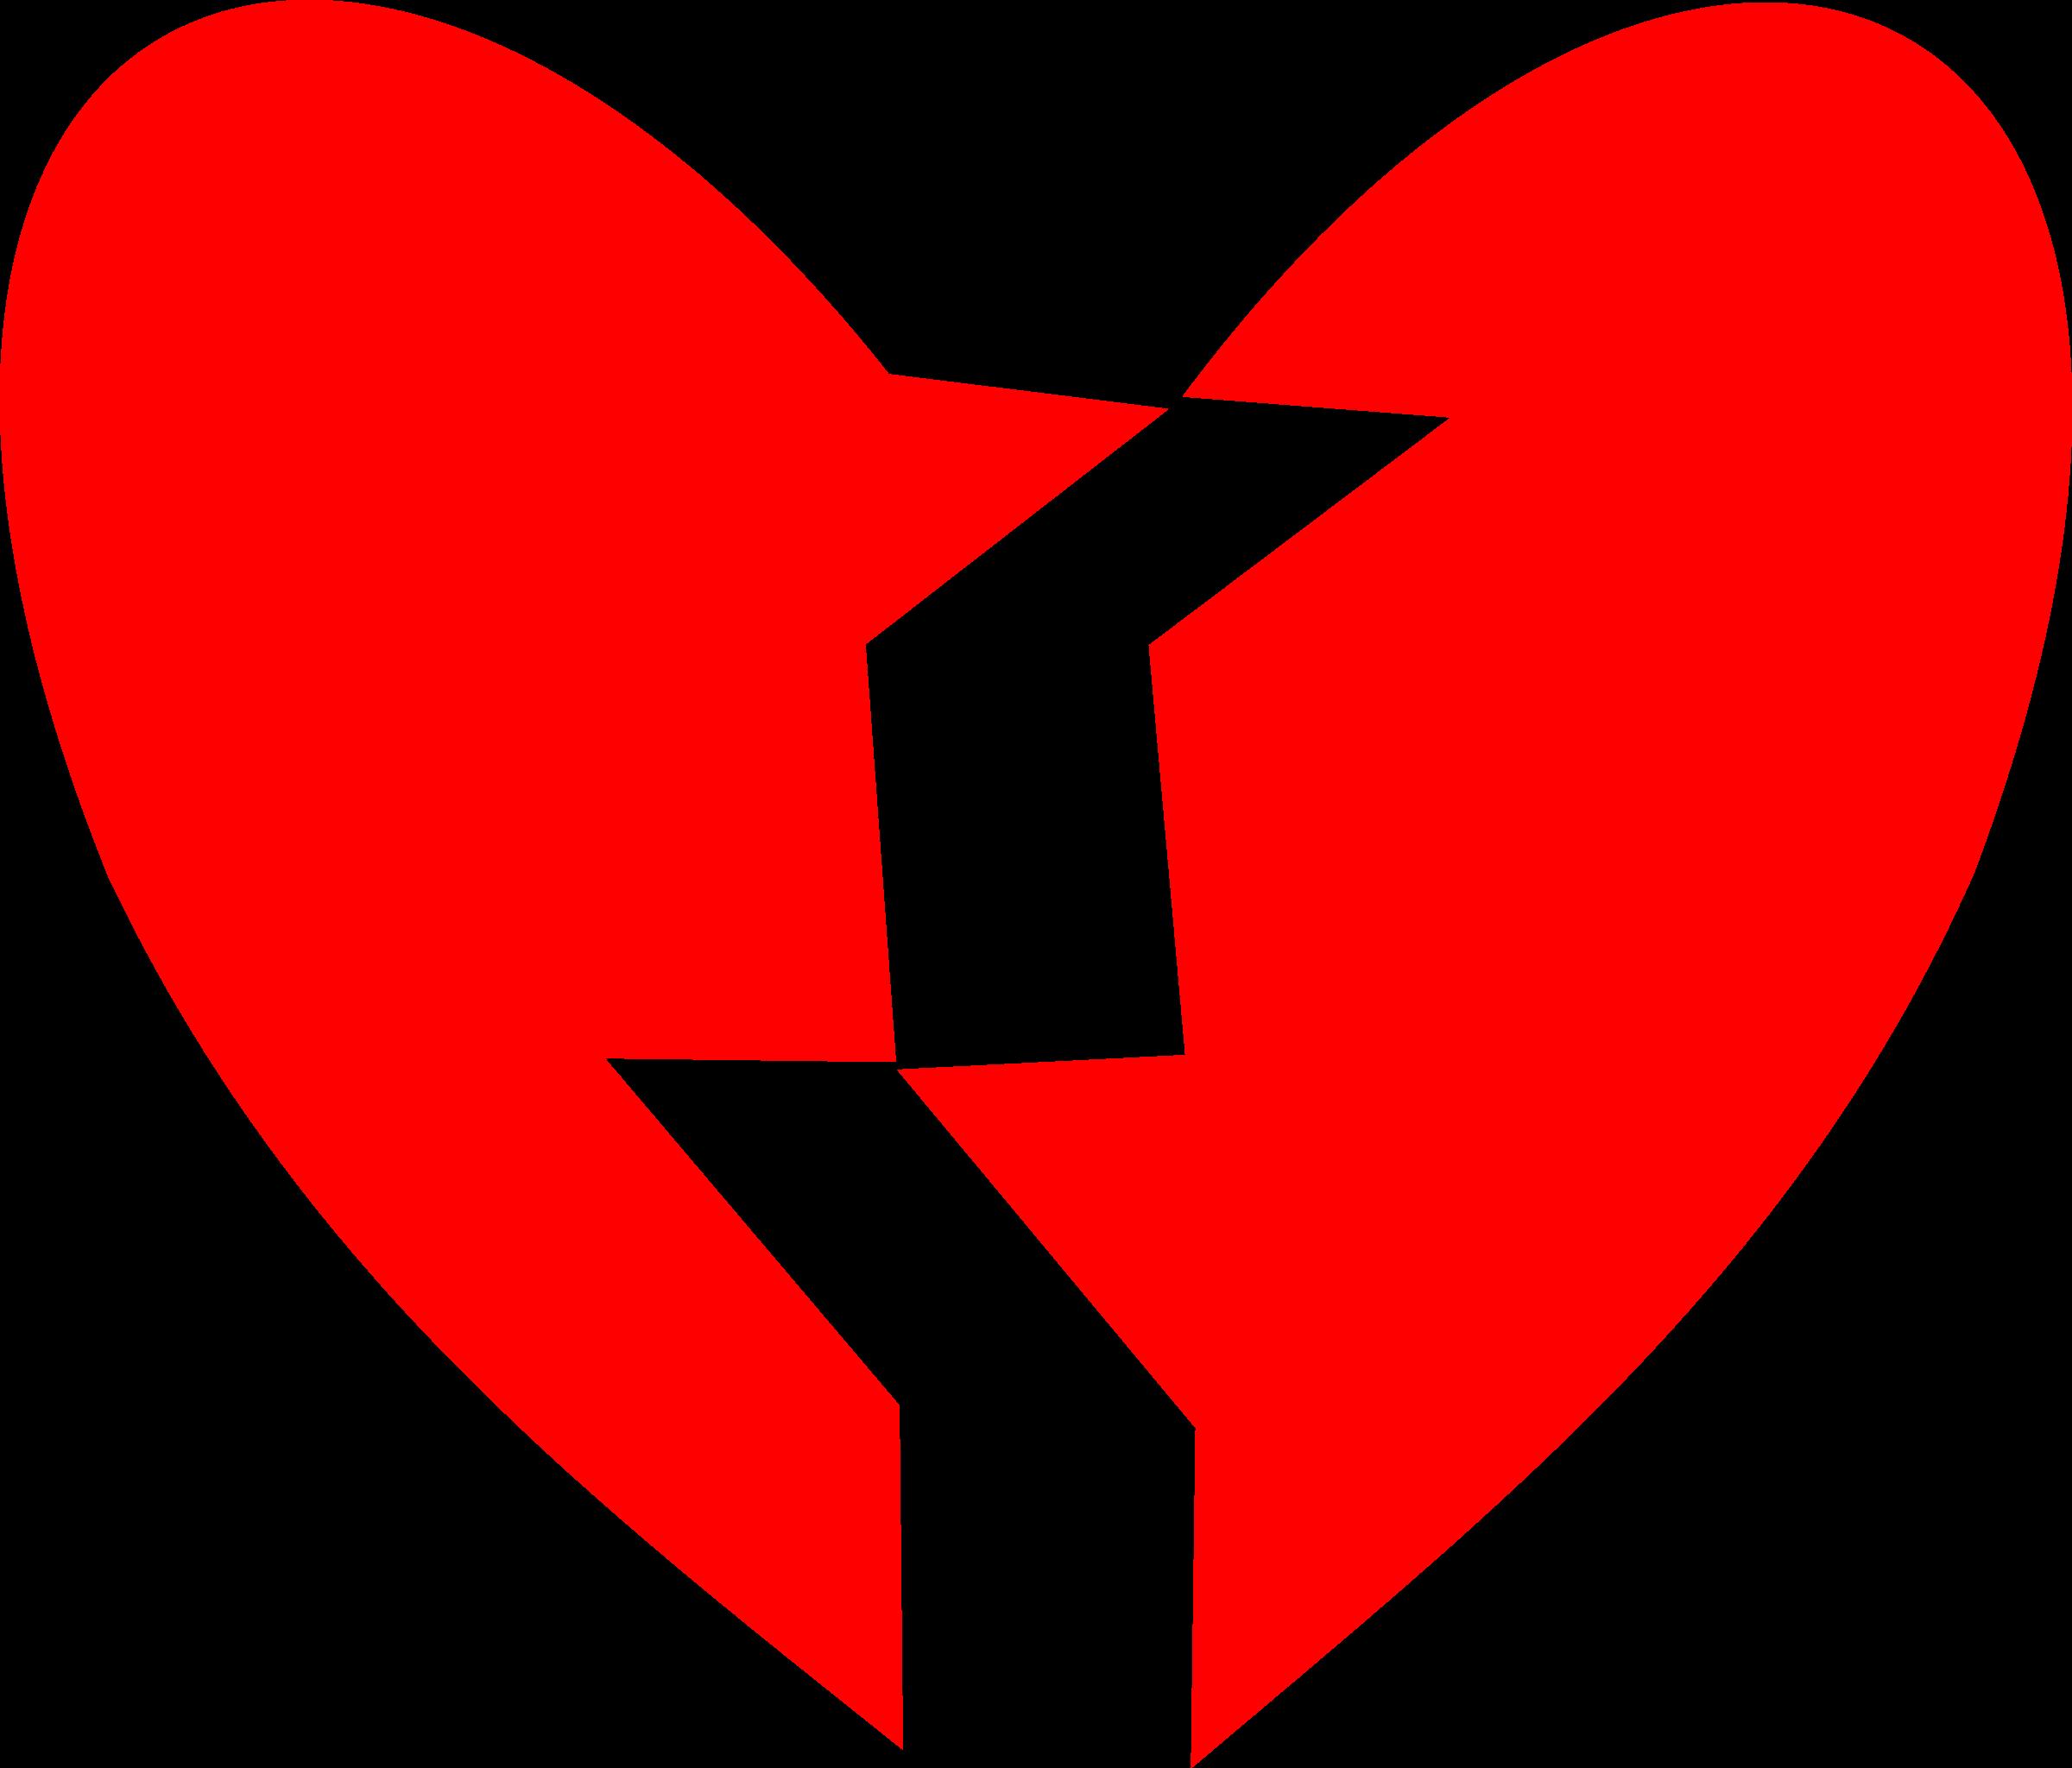 Heart clipart football. Broken big image png